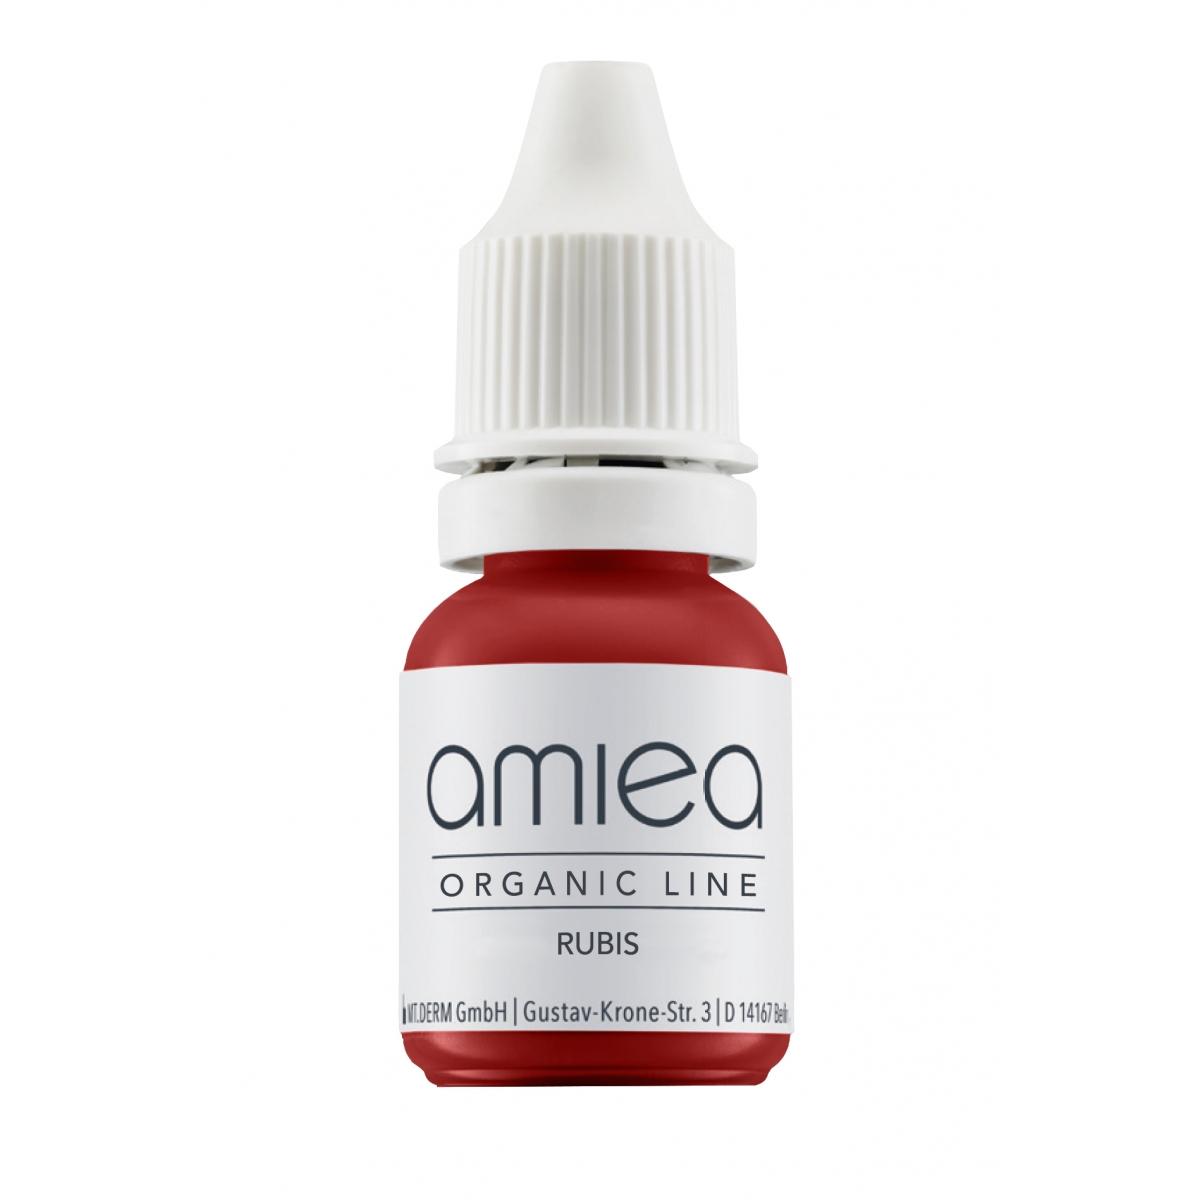 Organicline (5 ml)  - PIGMENTS AMIEA ORGANICLINE RUBIS, Flacon 5 ml